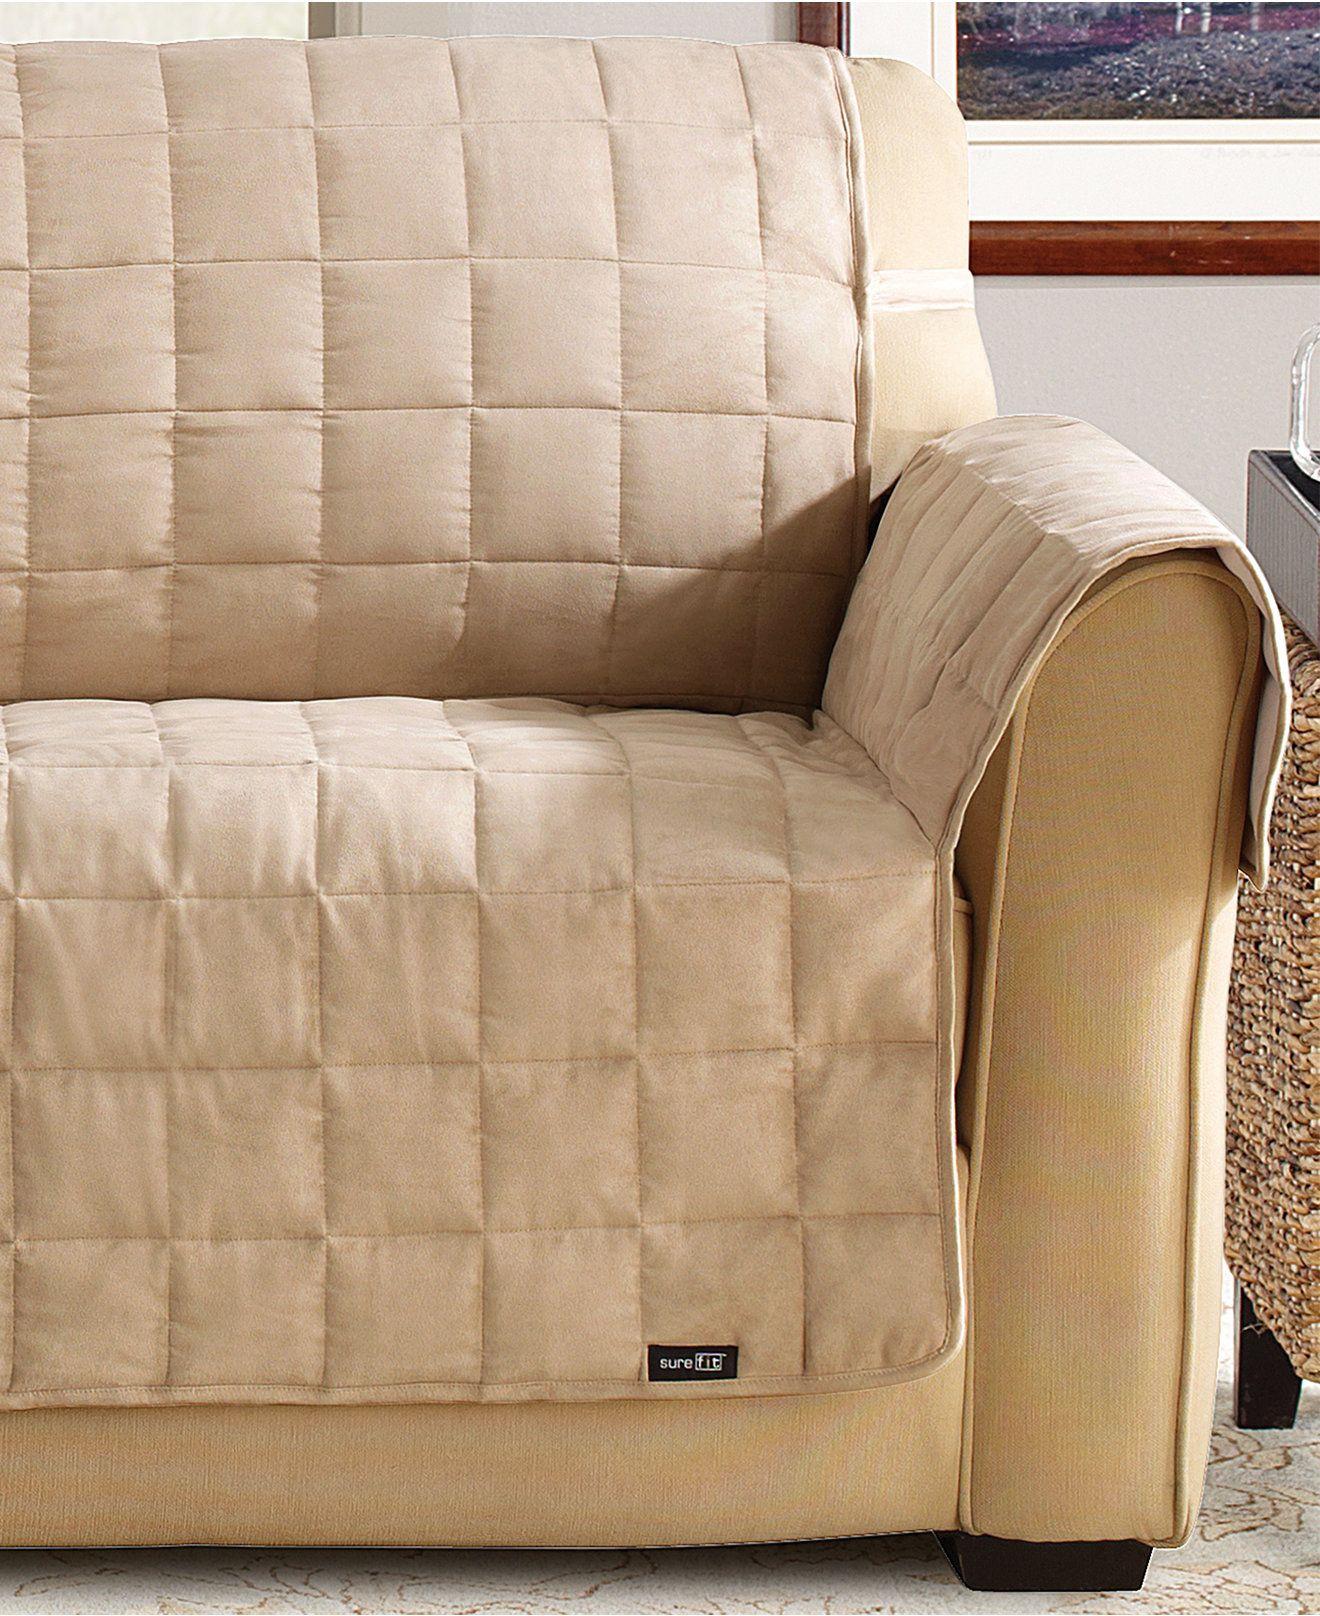 Awesome Waterproof Sofa Cover For Pets Elegant Waterproof Sofa